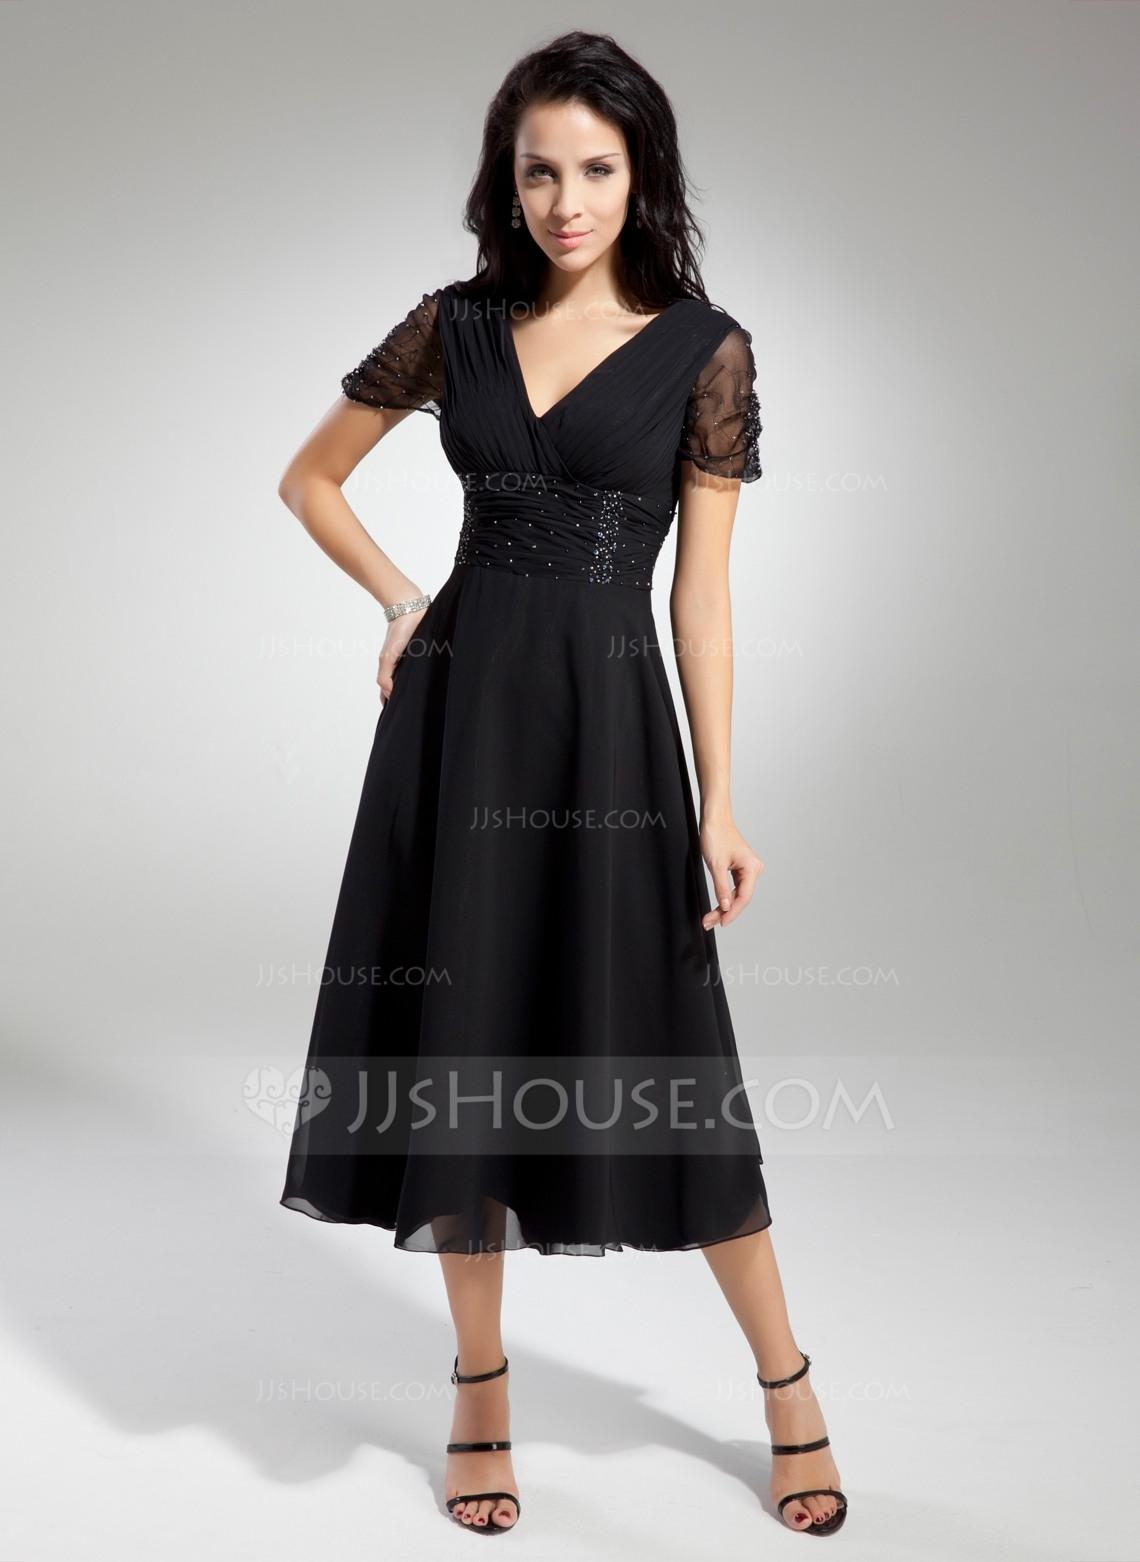 10 Fantastisch Elegante Kleider Wadenlang ÄrmelFormal Leicht Elegante Kleider Wadenlang Design